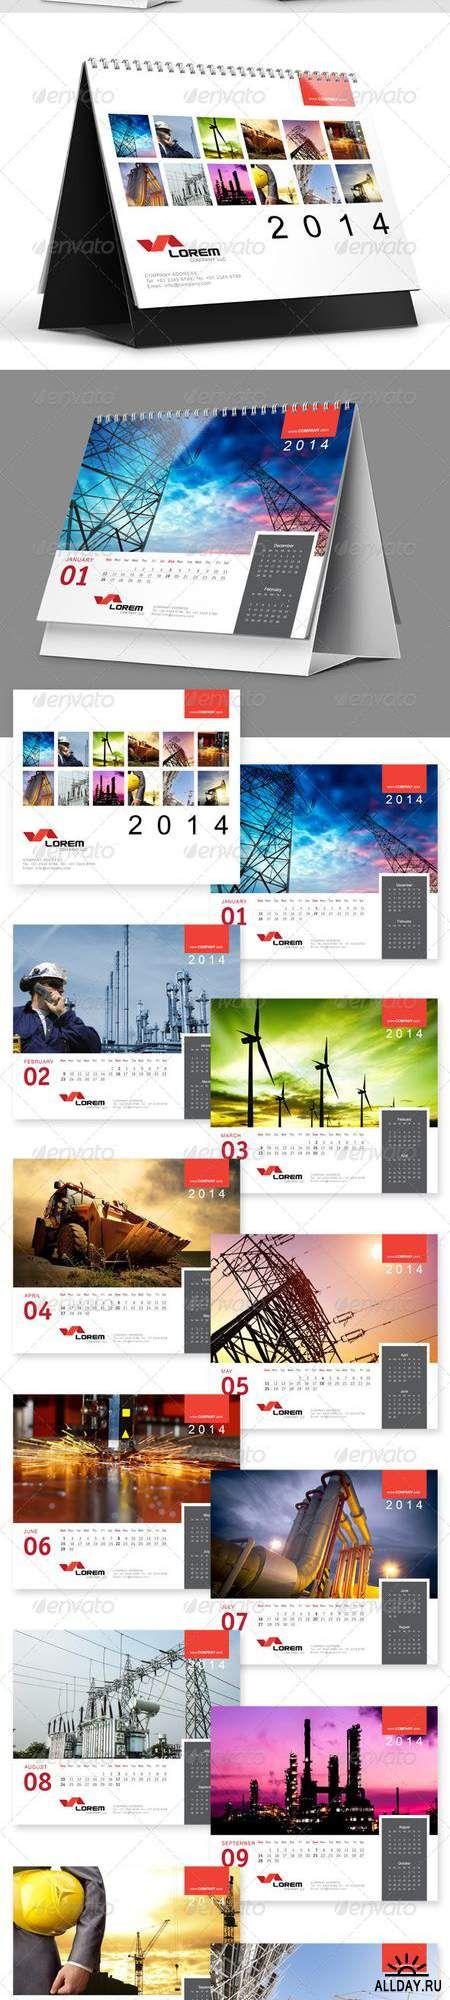 Calendar Sample Design 542 Best Design Images On Pinterest  Draping Planners And Calendar